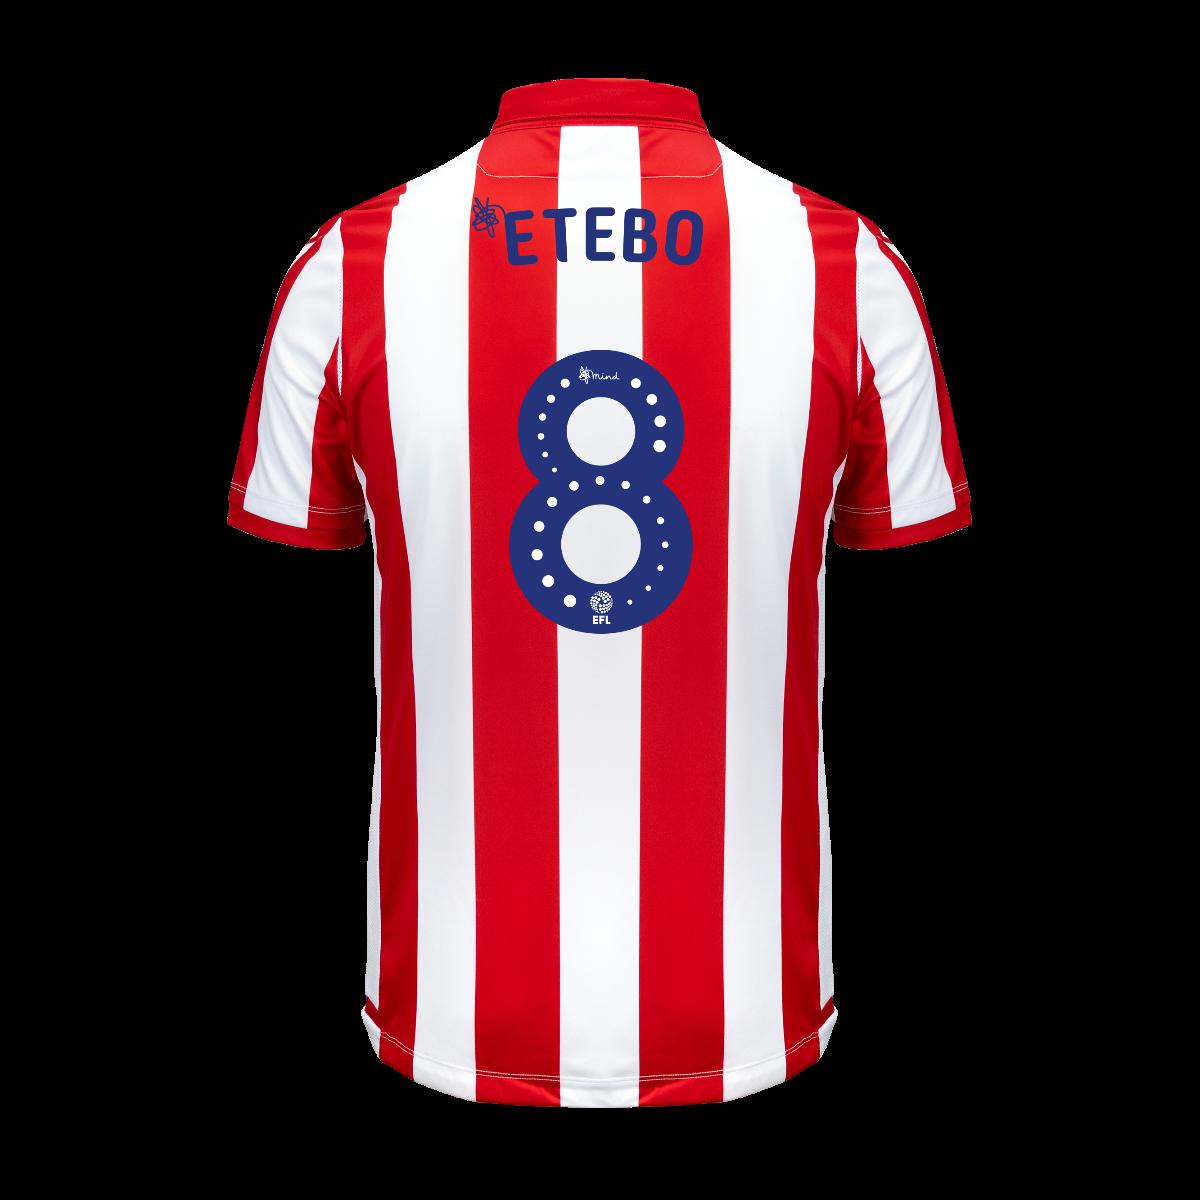 2019/20 Junior Home SS Shirt - Etebo